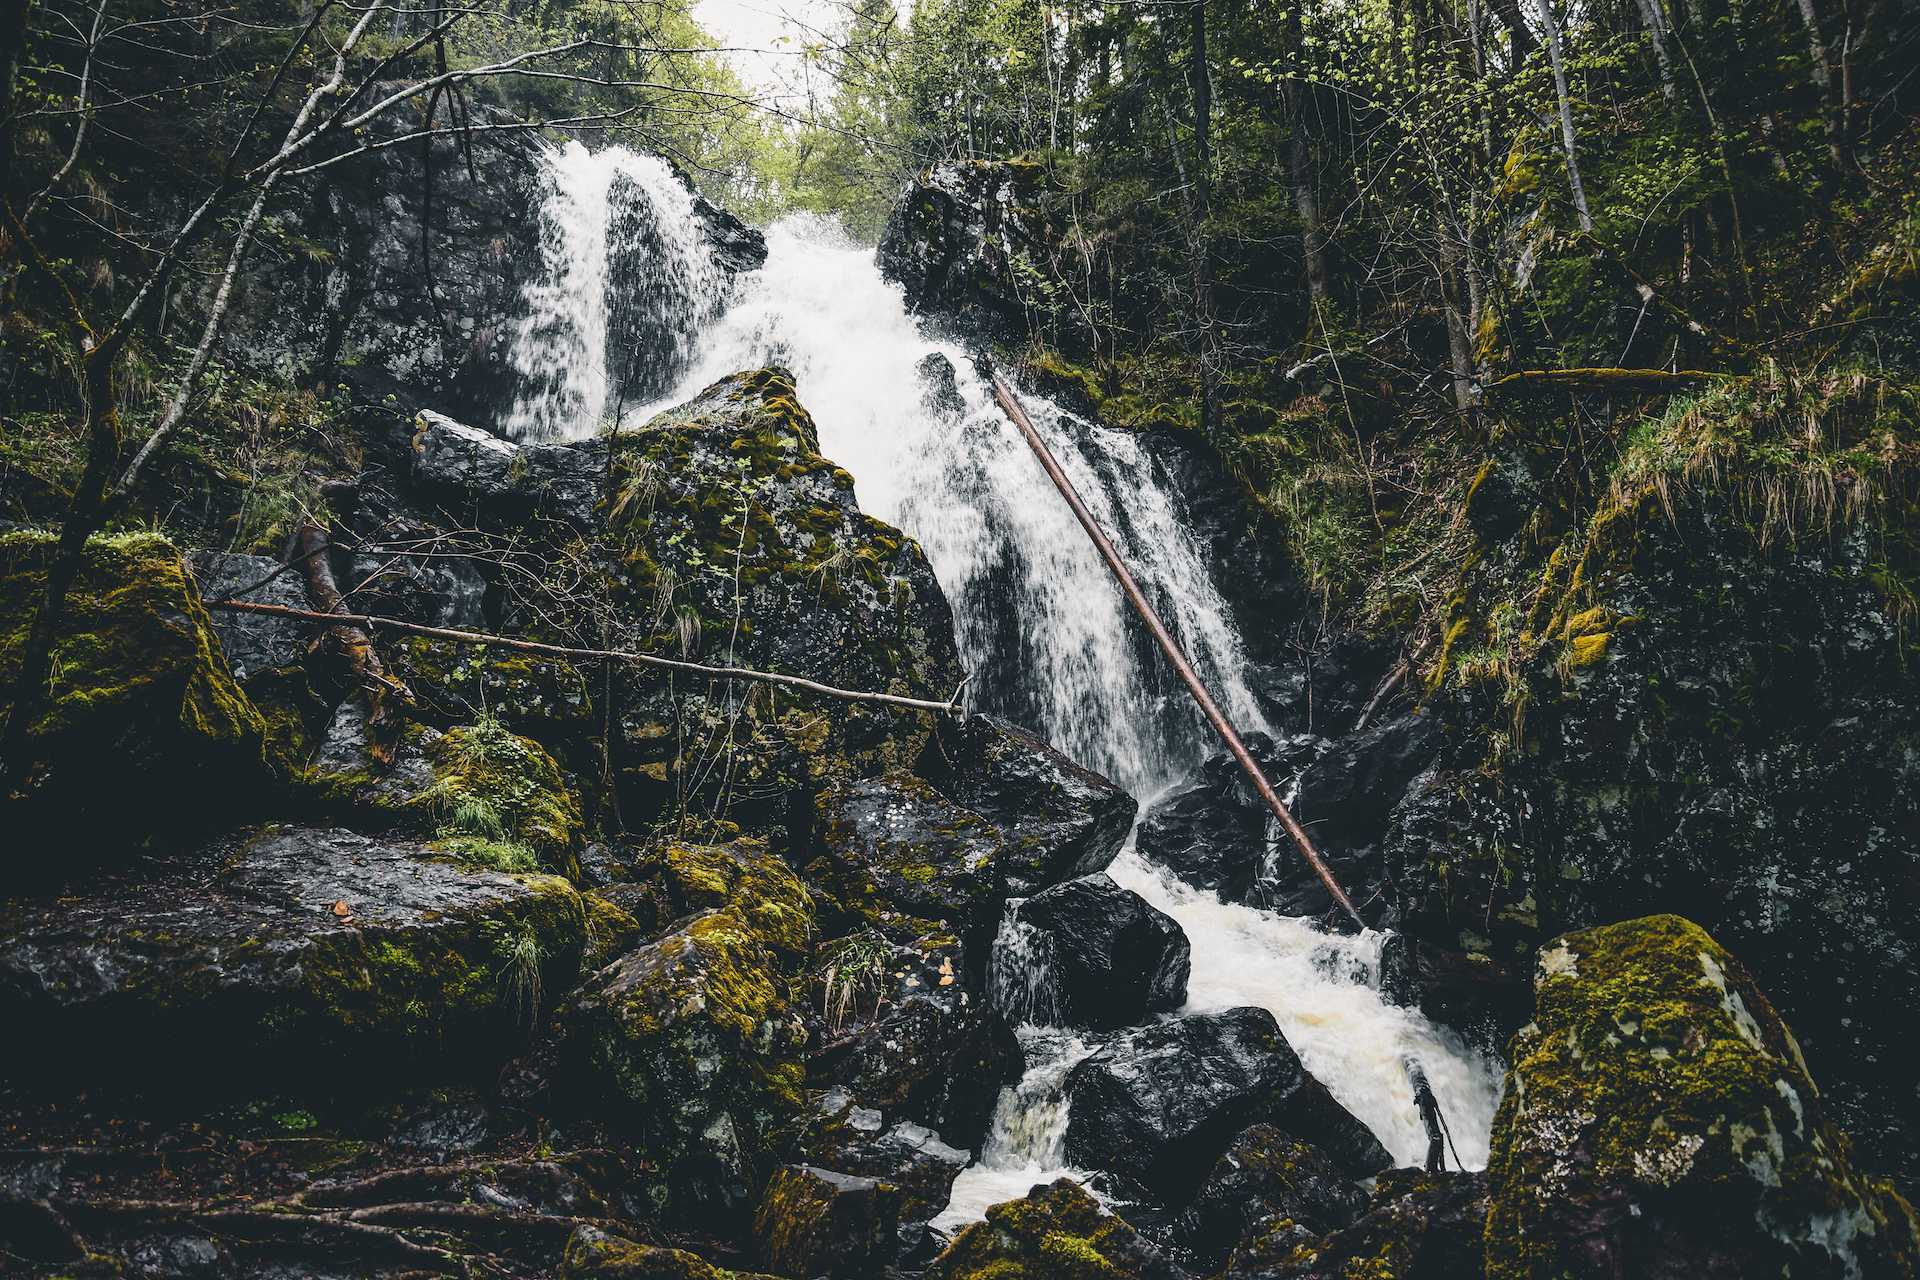 wodospad wAsker